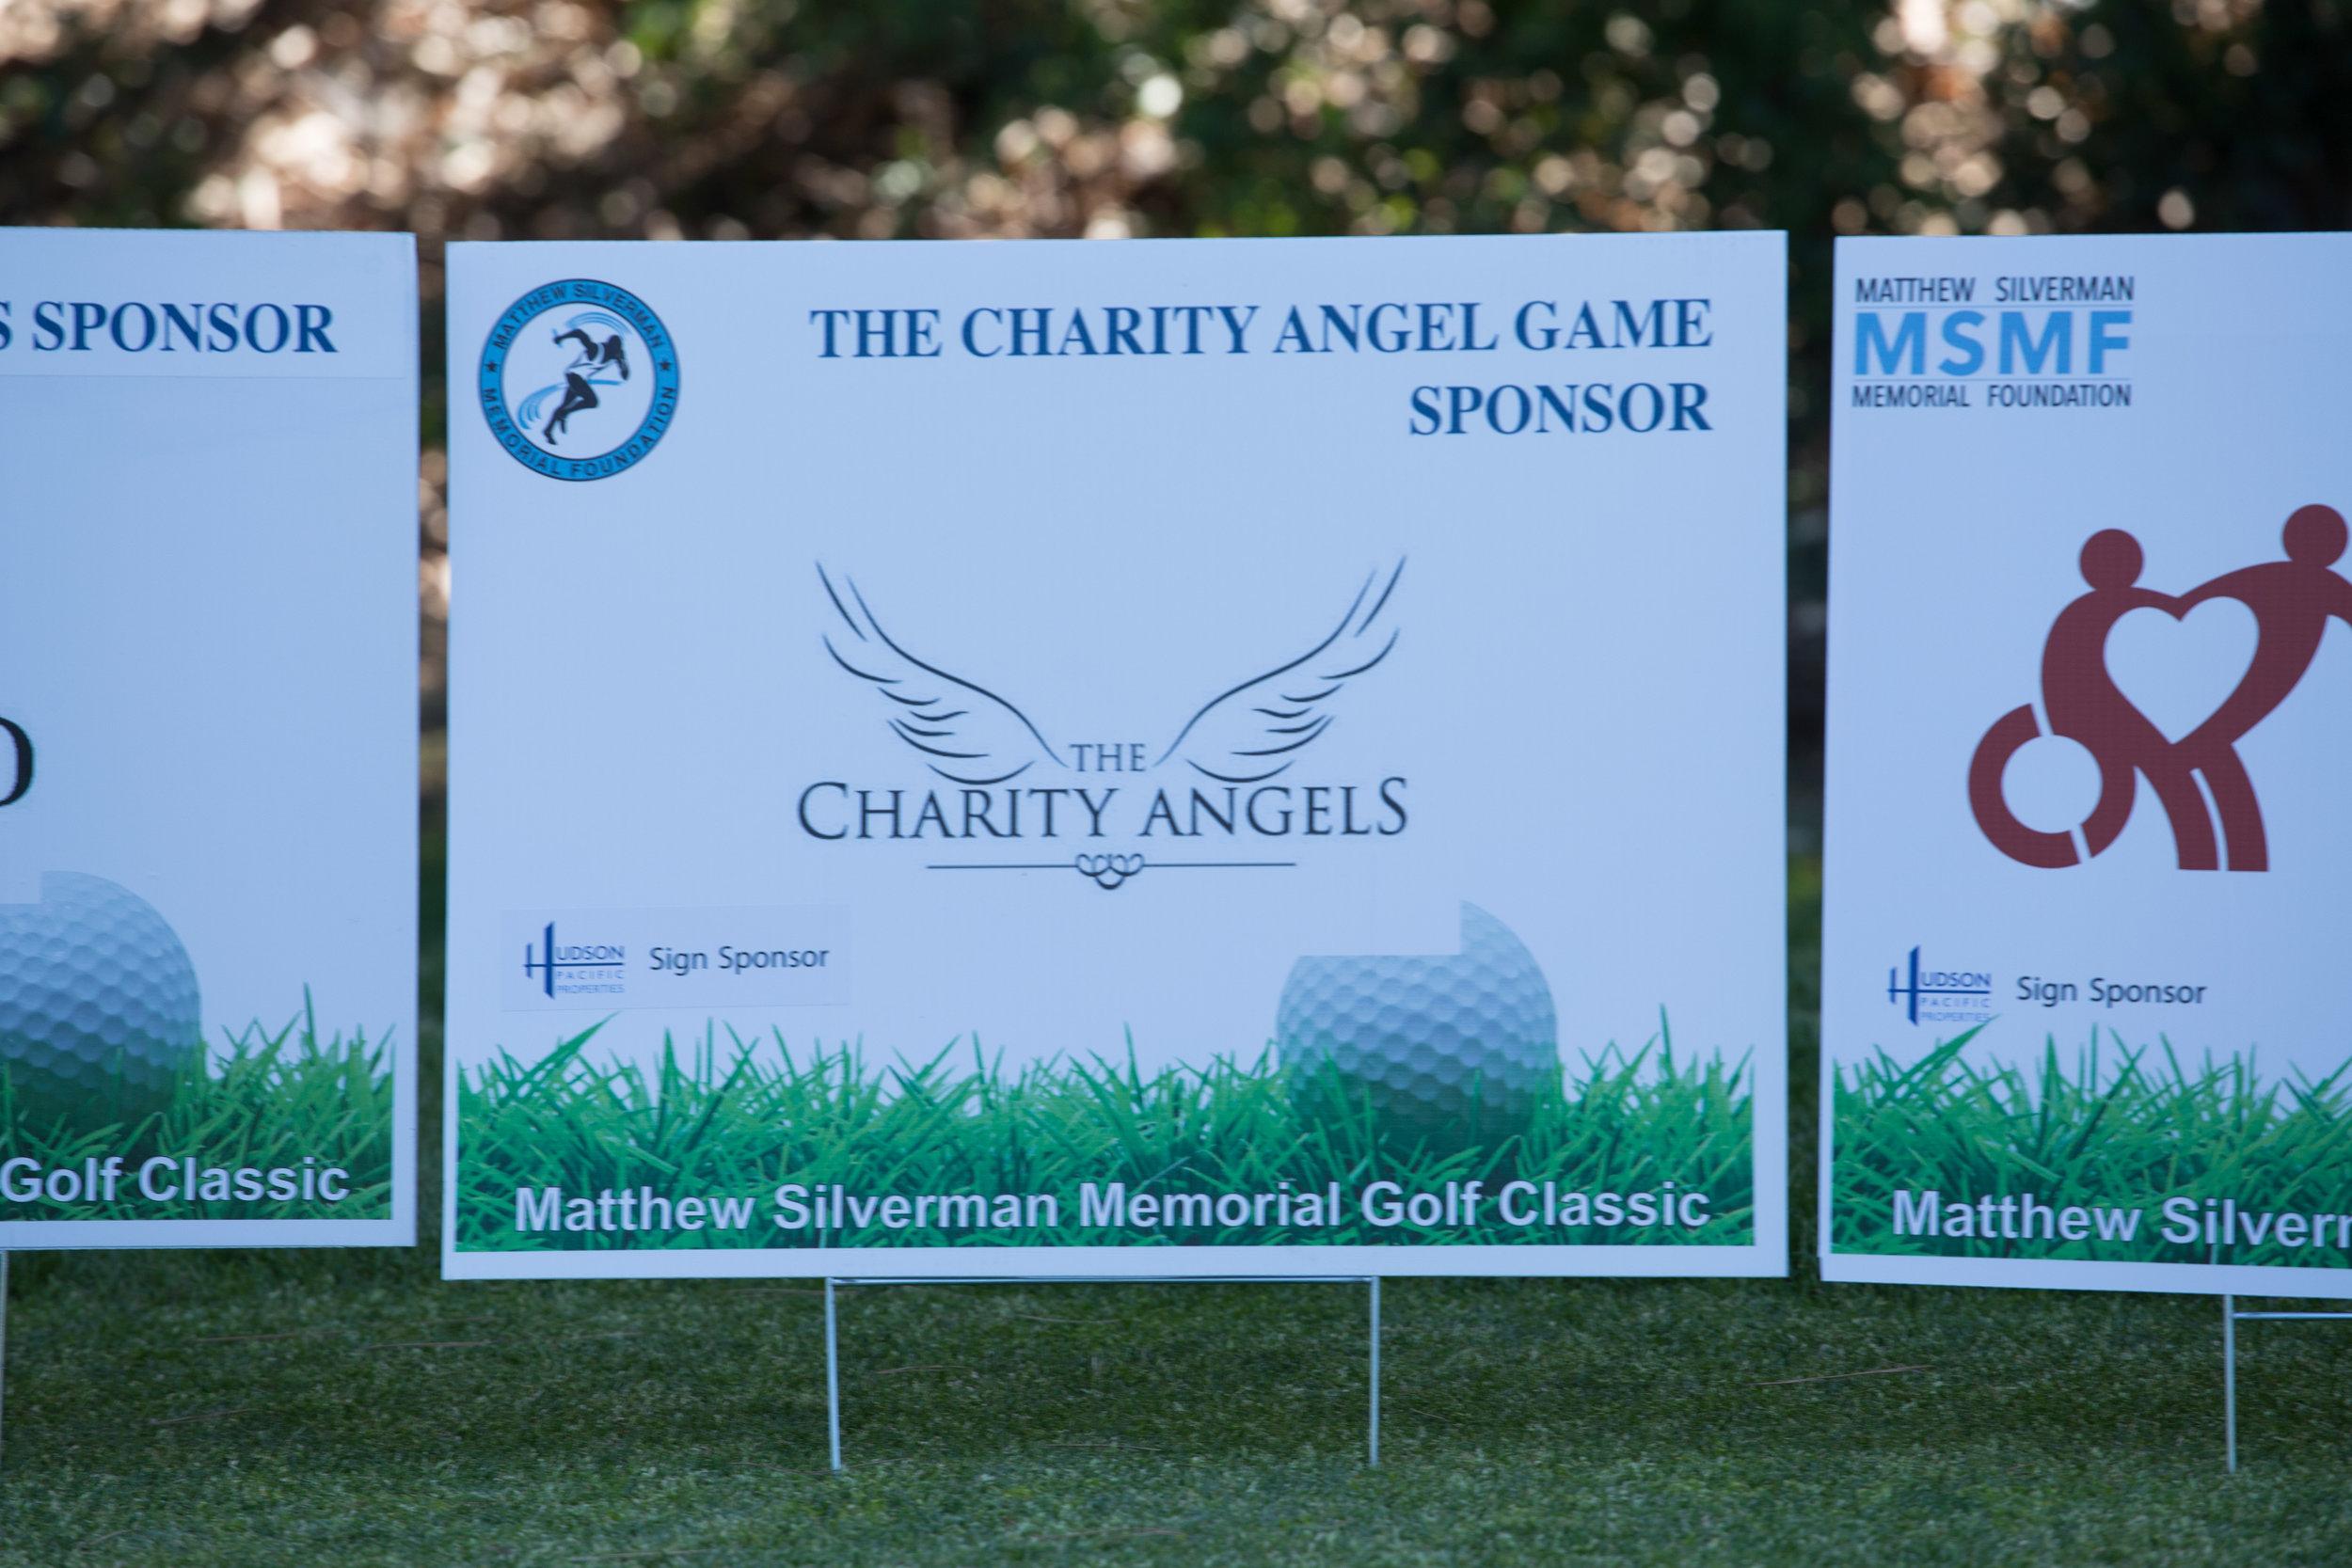 IMG_7816-SPONSOR SIGN-Charity Angels.jpg